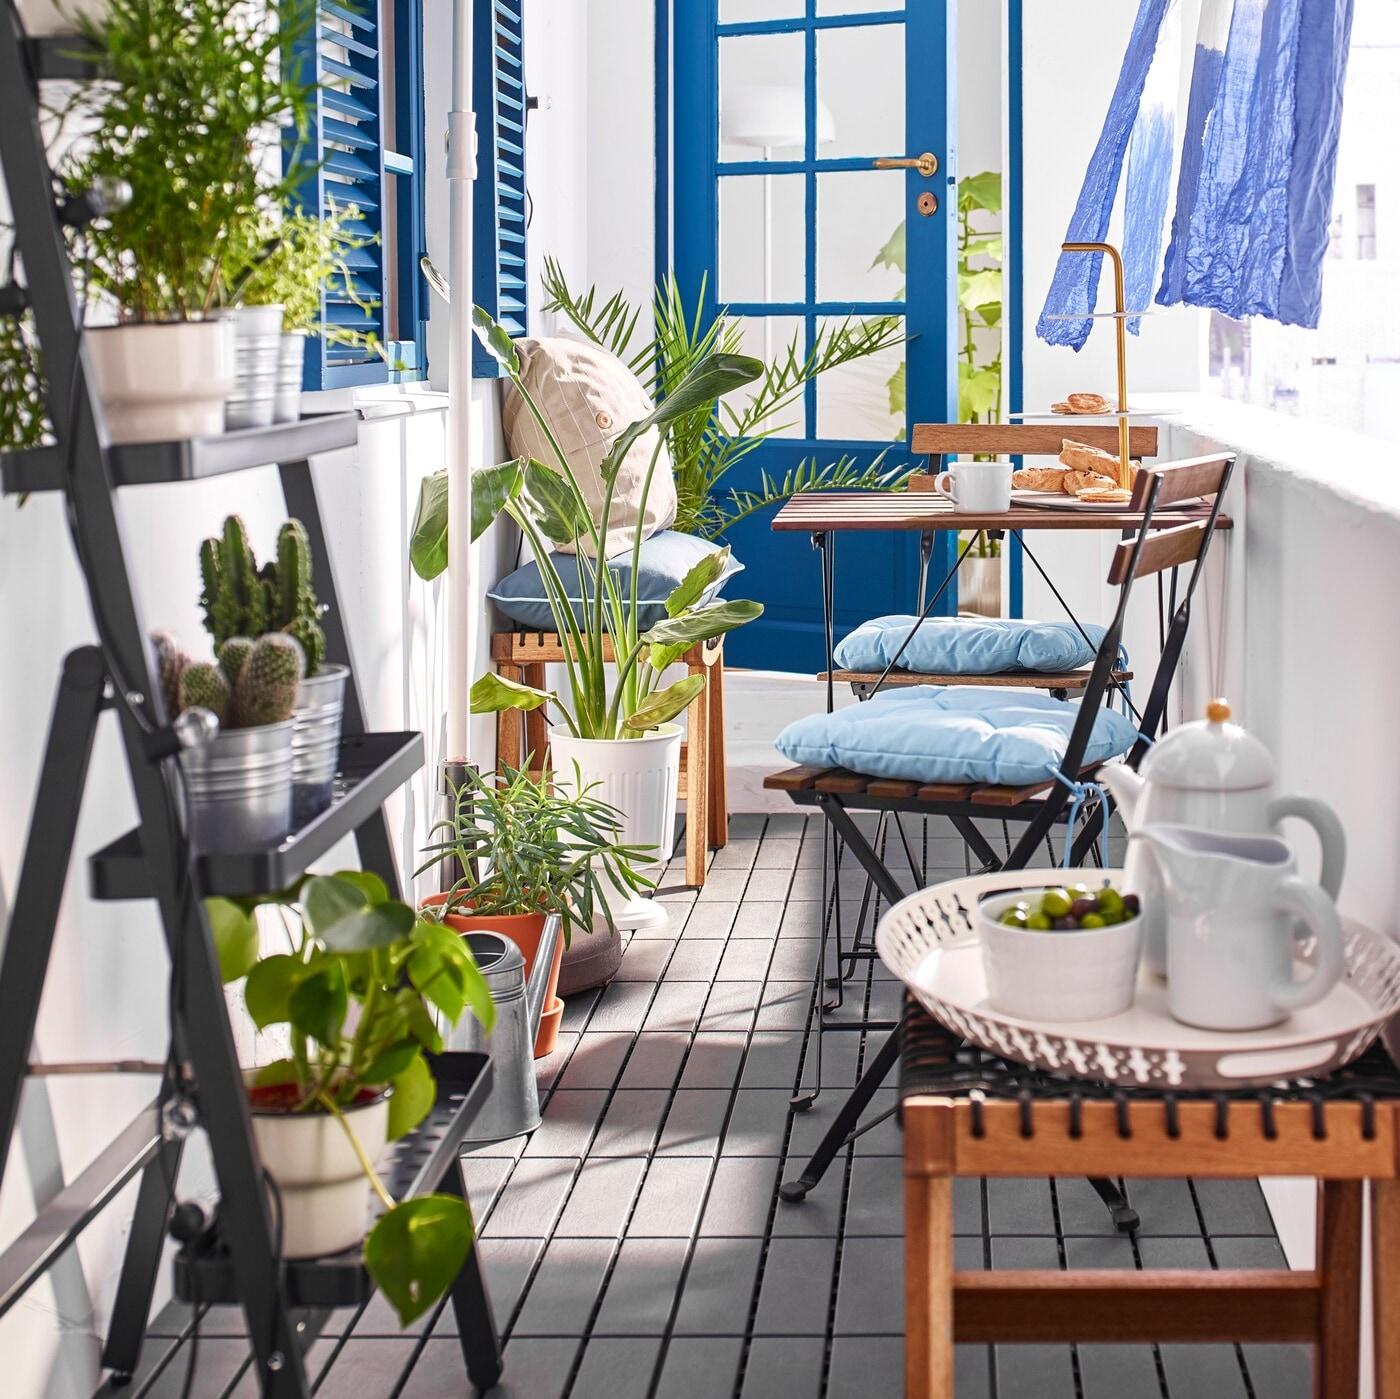 TÄRNO كراسي وطاولات من ايكيا لون بني في شرفة خارجية ضيقة.